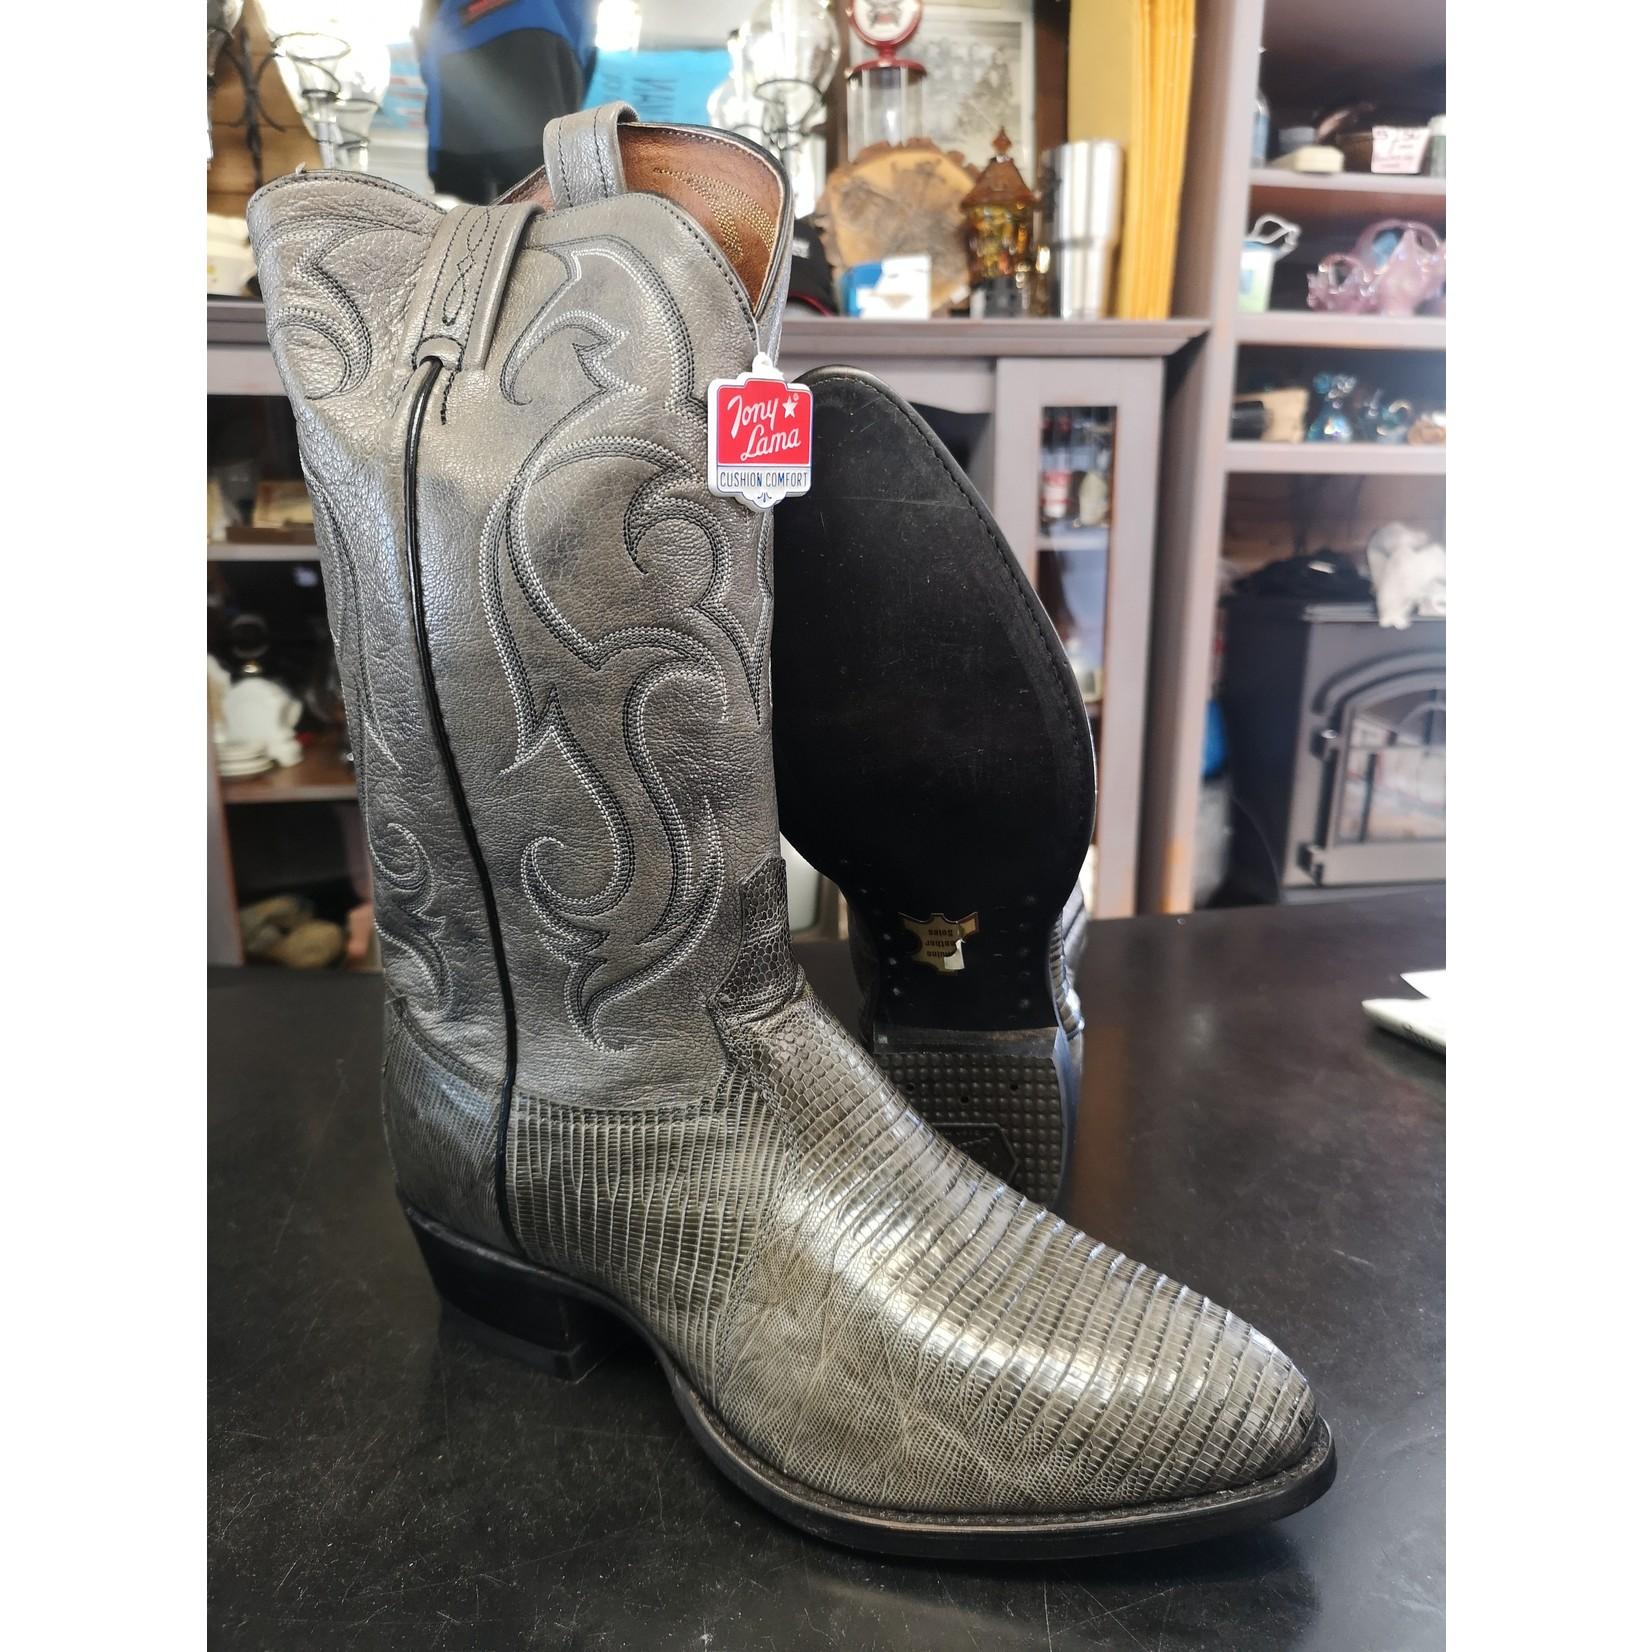 Tony Lama Tony Lama Men's Exotic Cowboy Boot - CZ725 - SIZE 10.5